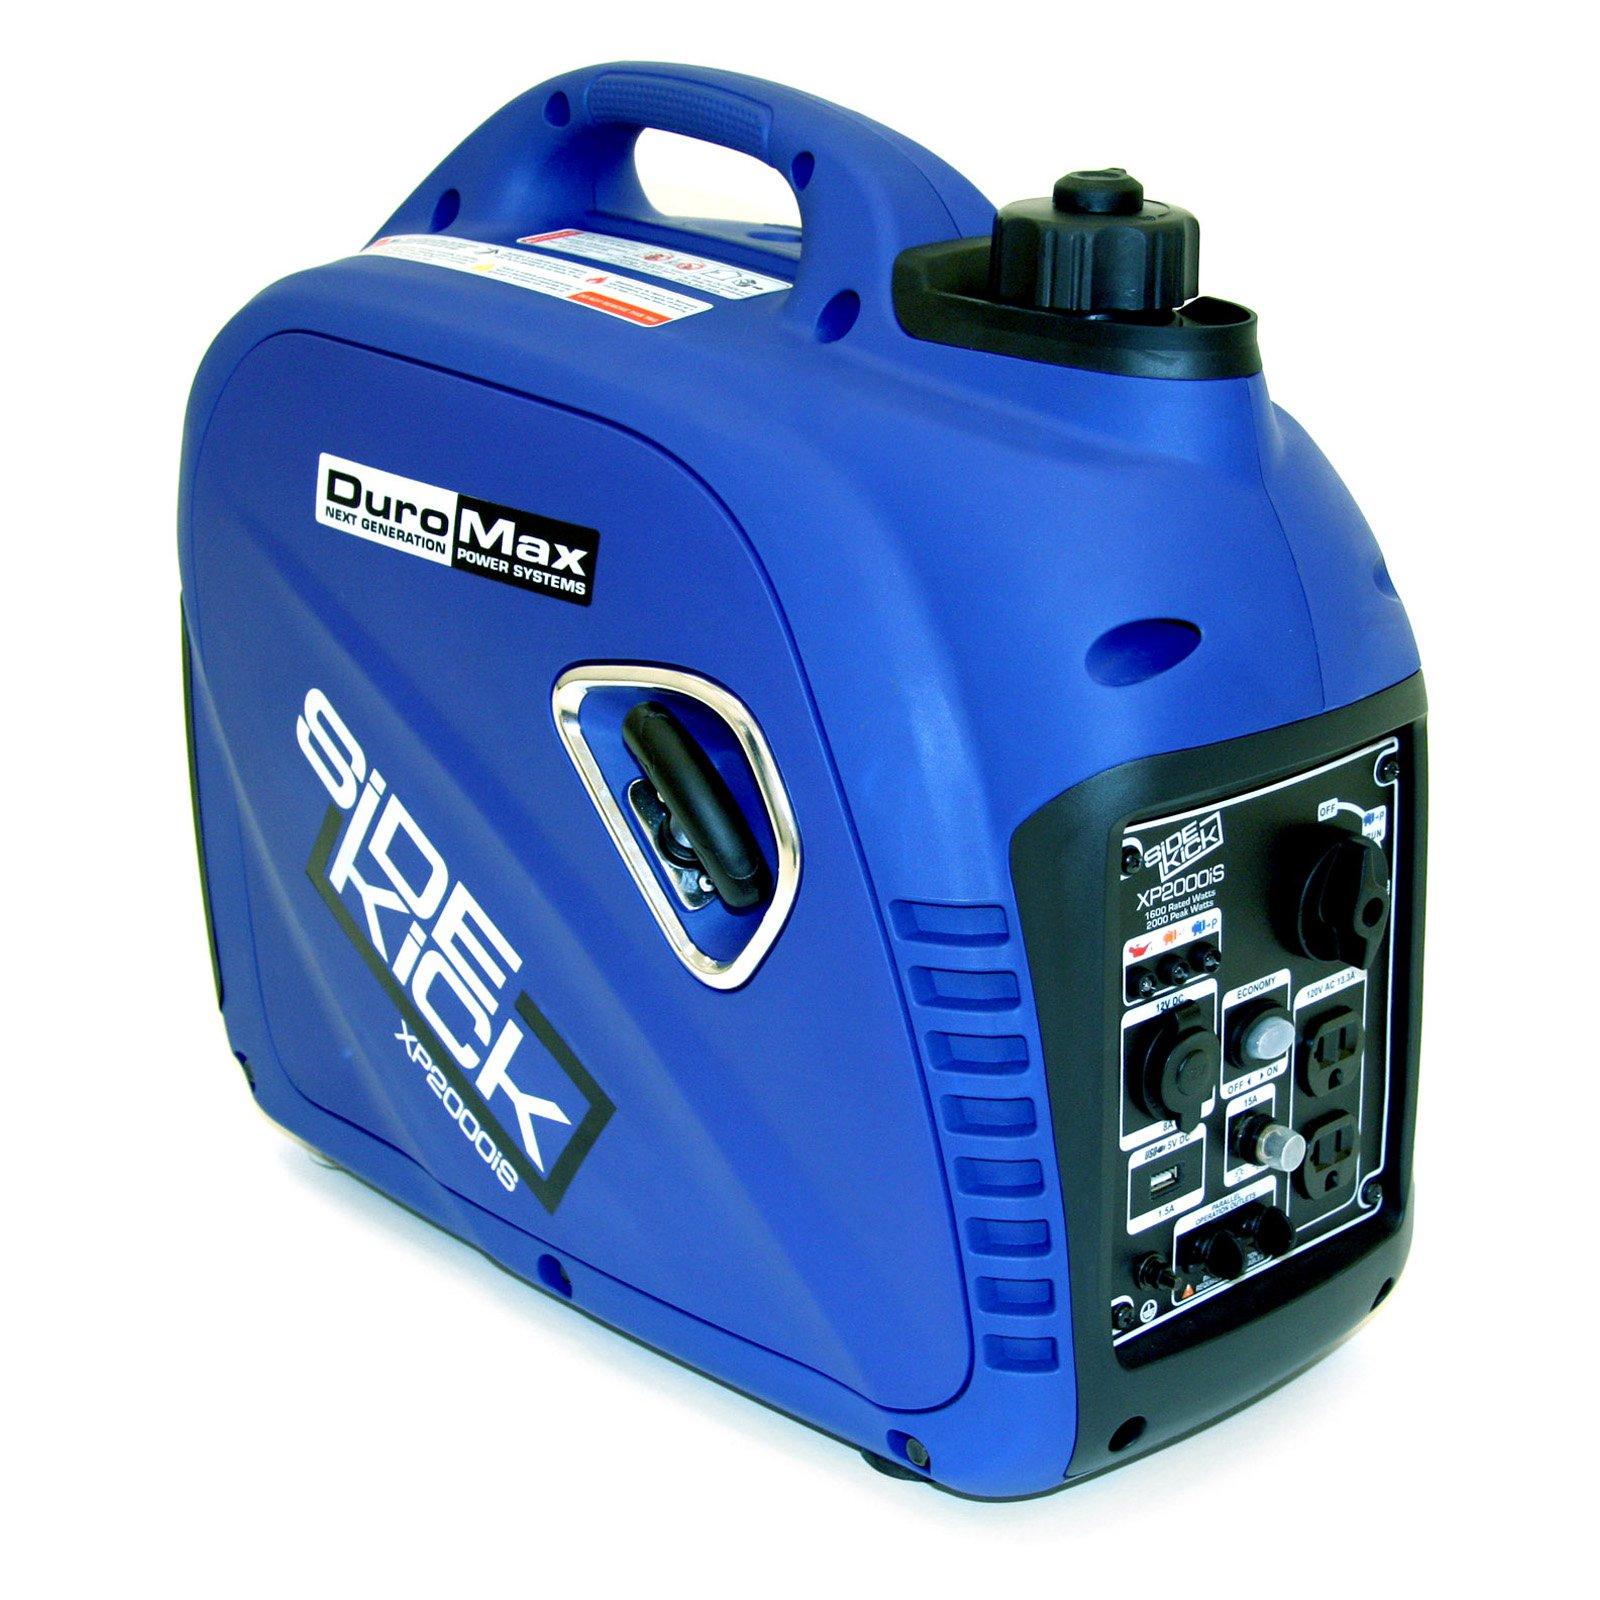 Duromax 2000 Watt Gas Powered Digital Inverter Portable G...